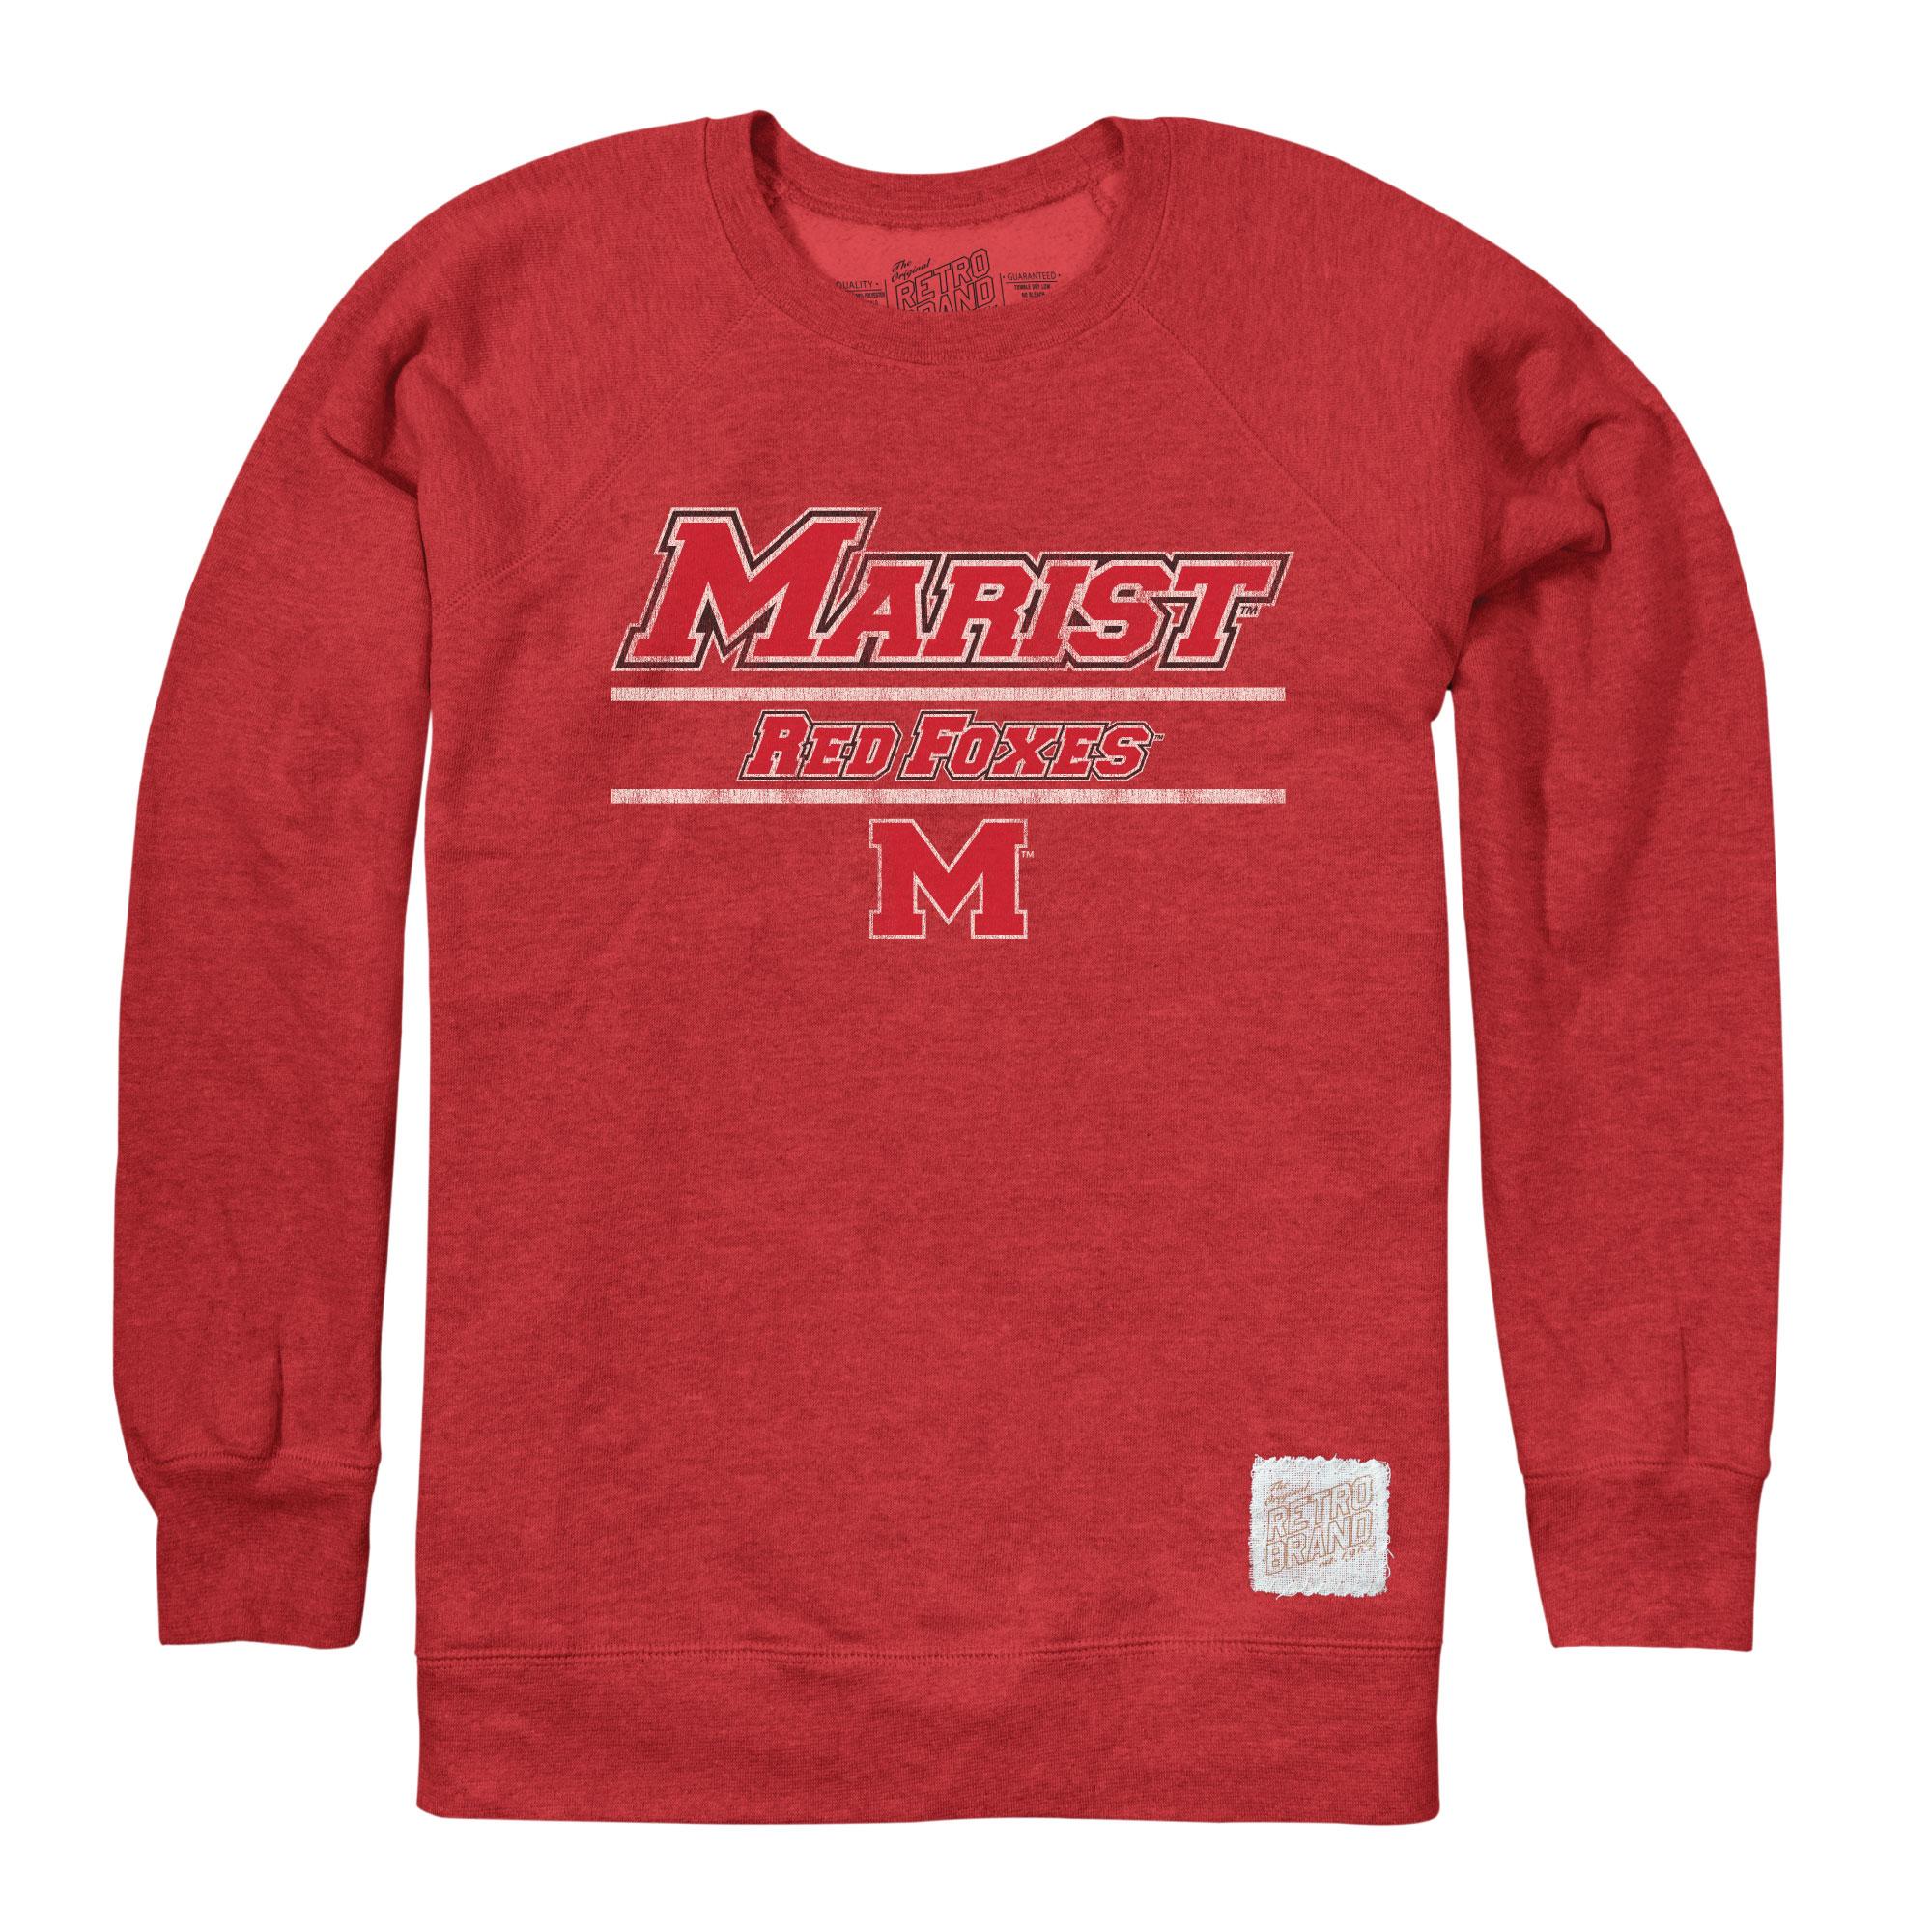 Marist College Retro Brand Heather Fleece Crew